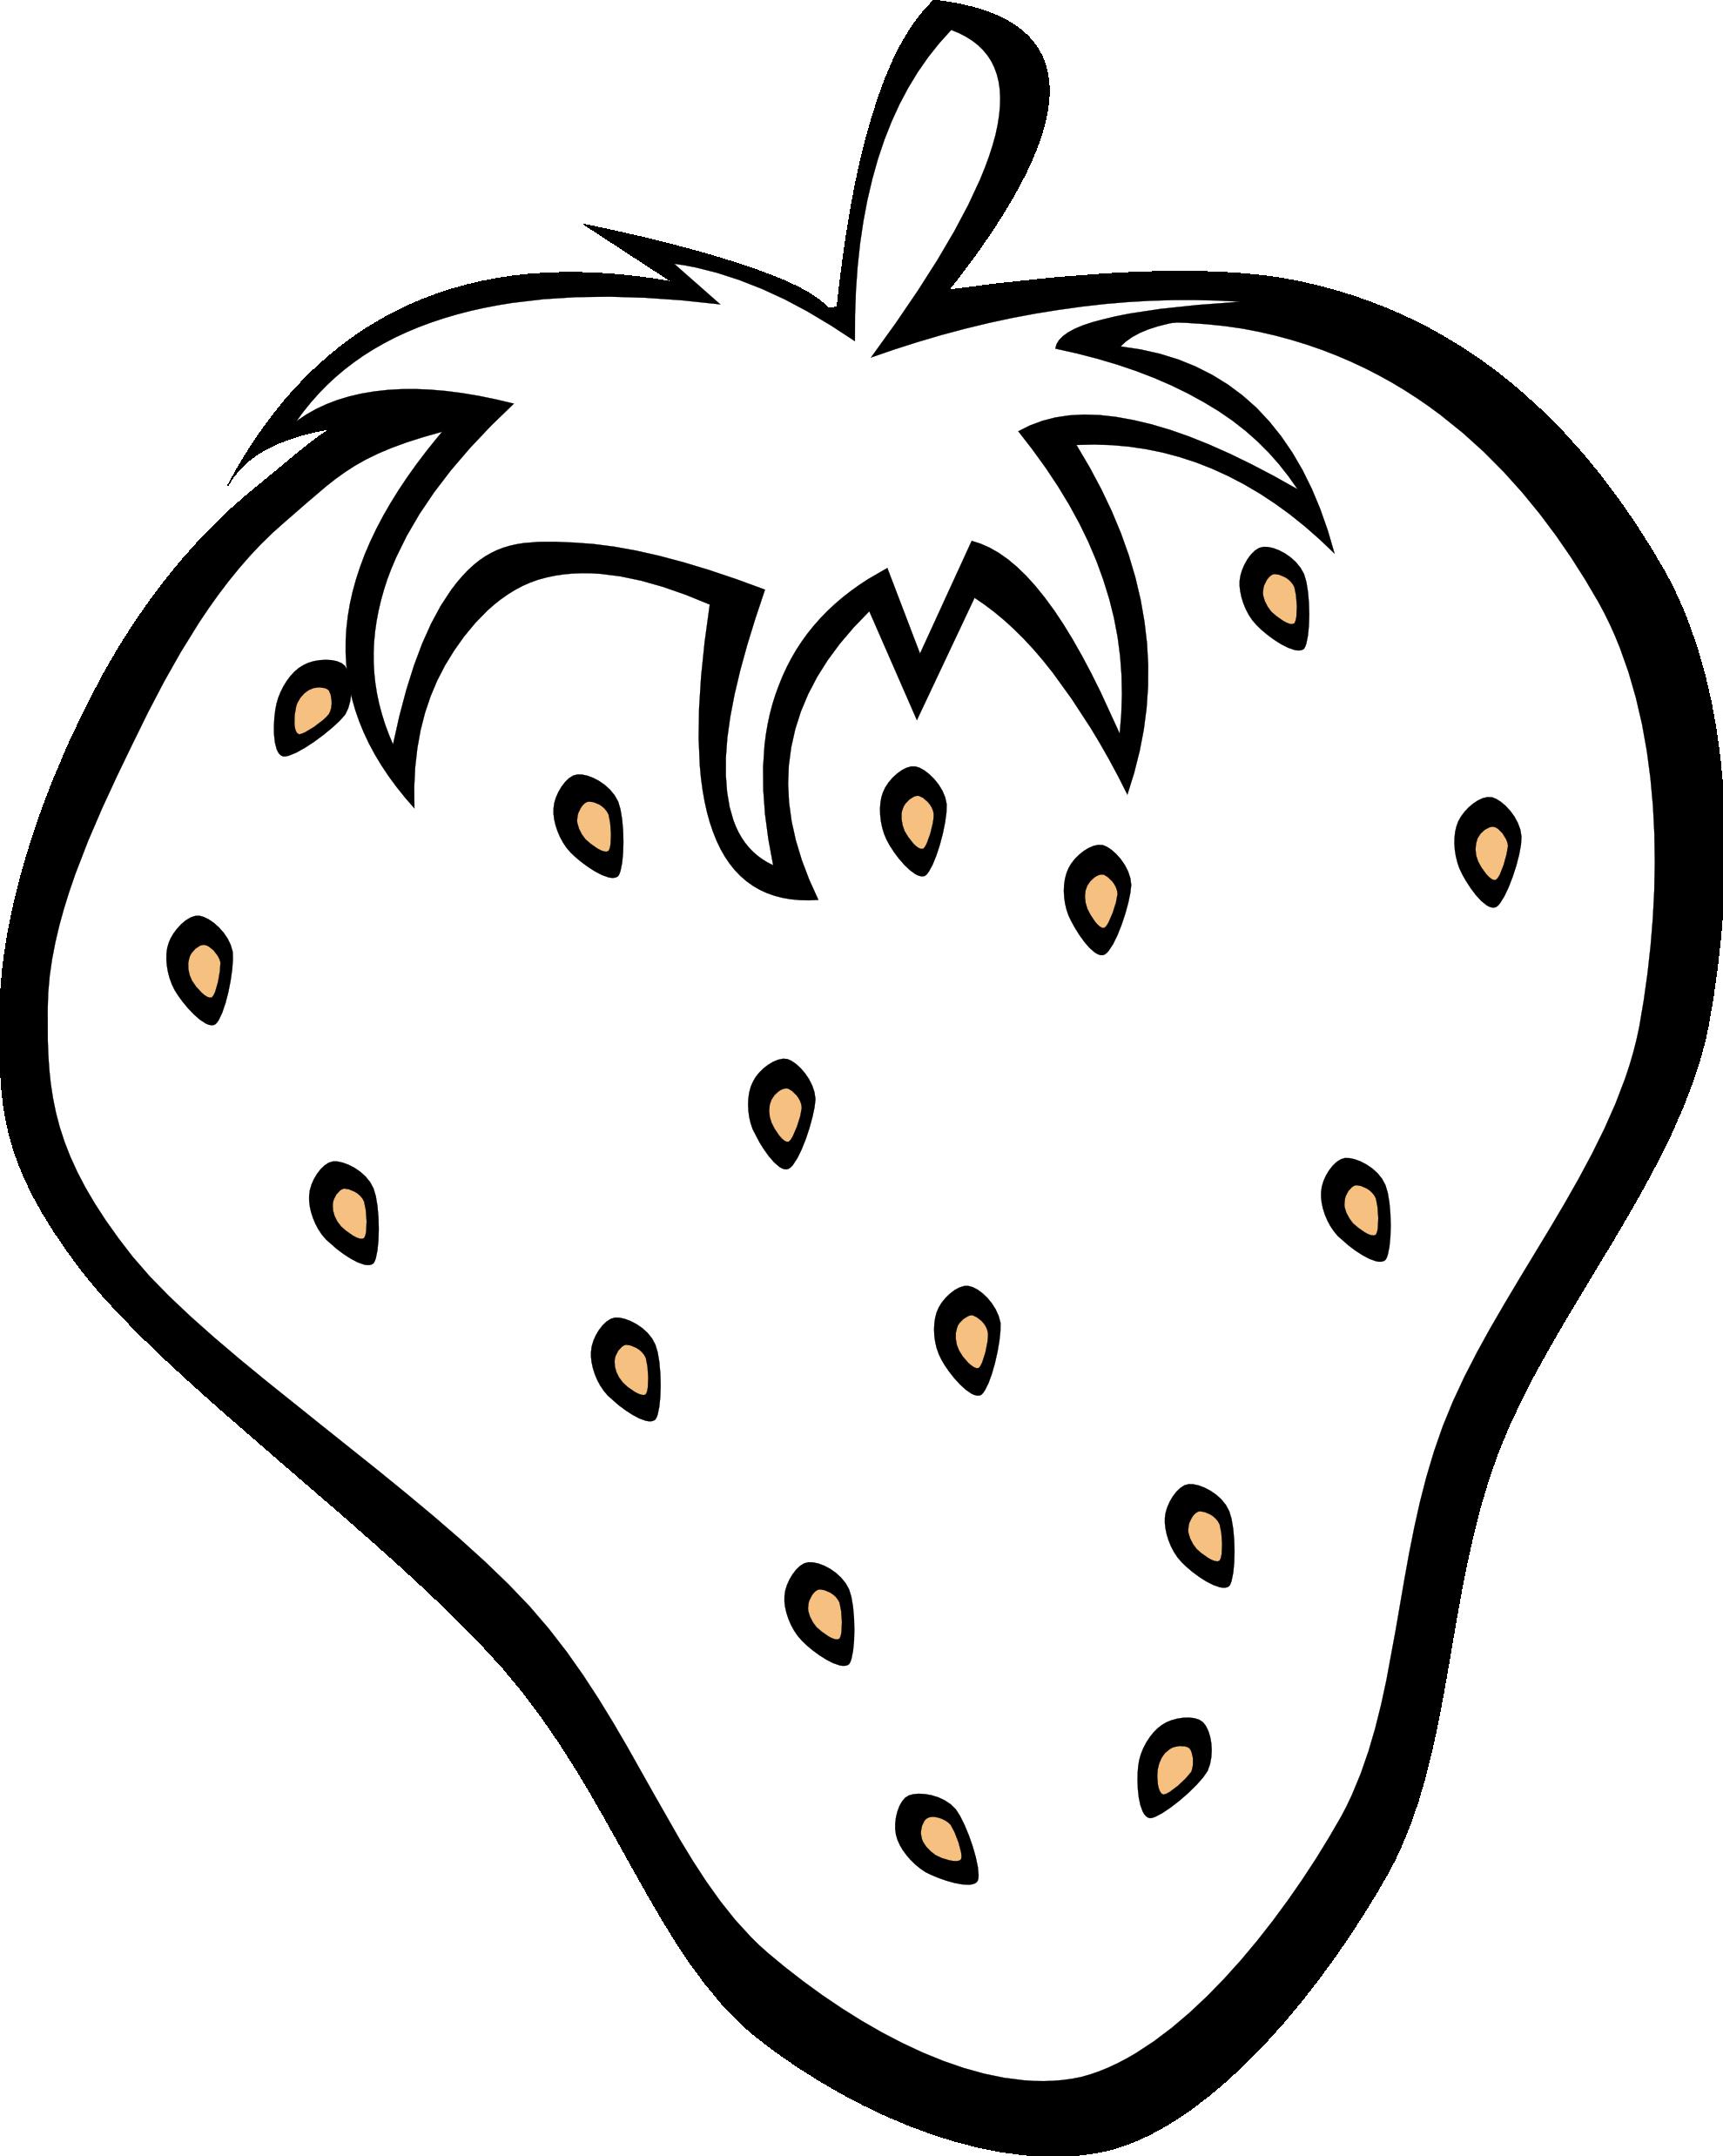 Mango clipart individual fruit. Realistic free on dumielauxepices